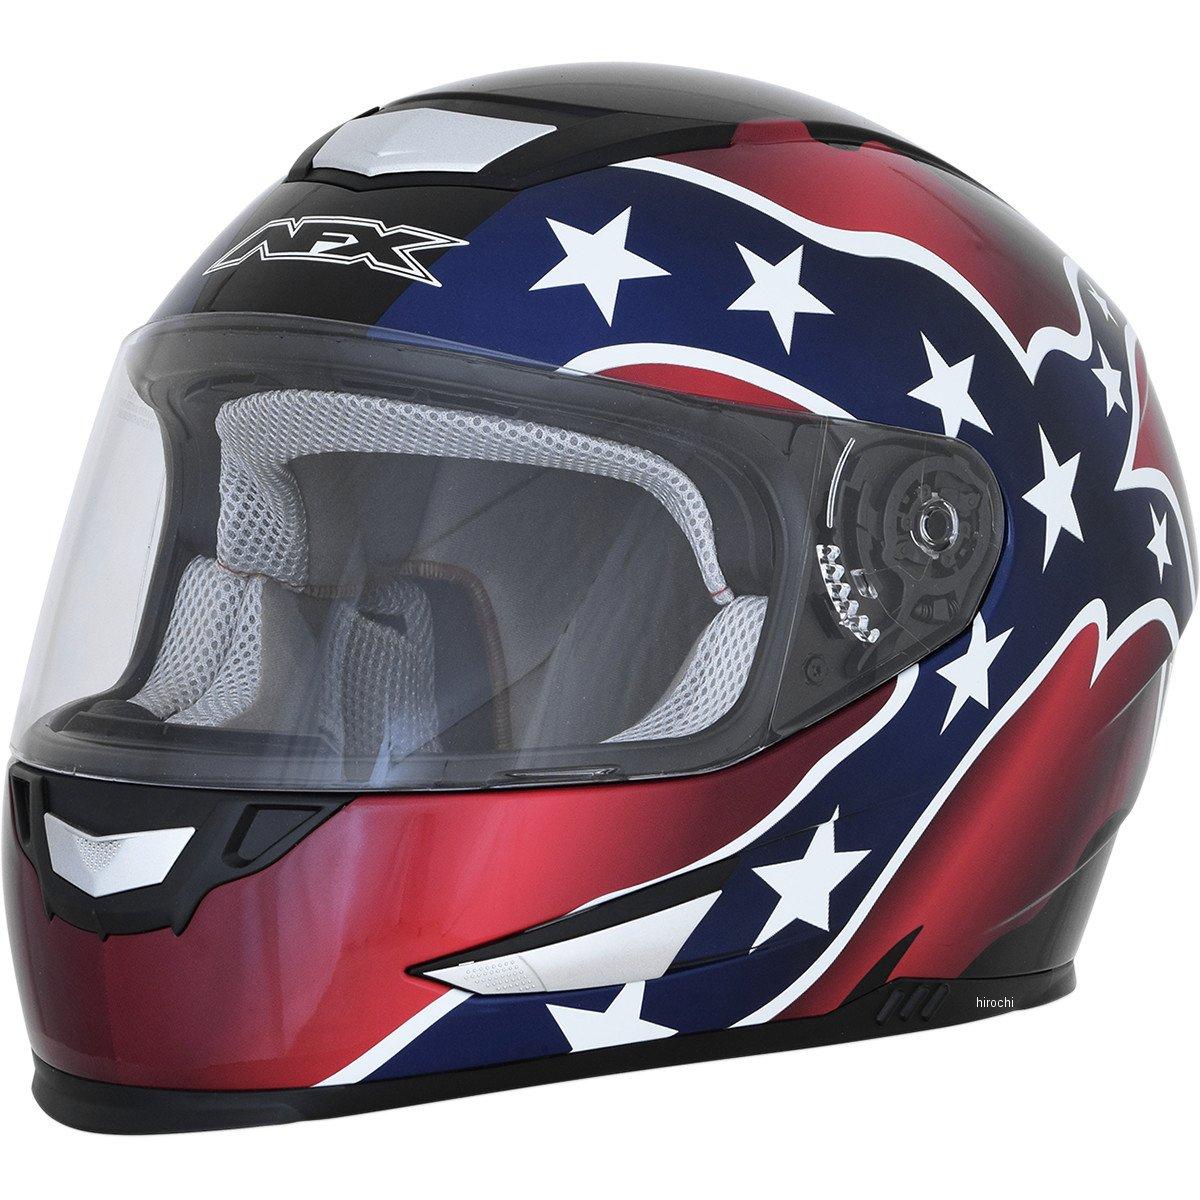 【USA在庫あり】 AFX フルフェイスヘルメット FX-99 黒レベル(つや有り) Mサイズ (58cm-59cm) 0101-11372 JP店